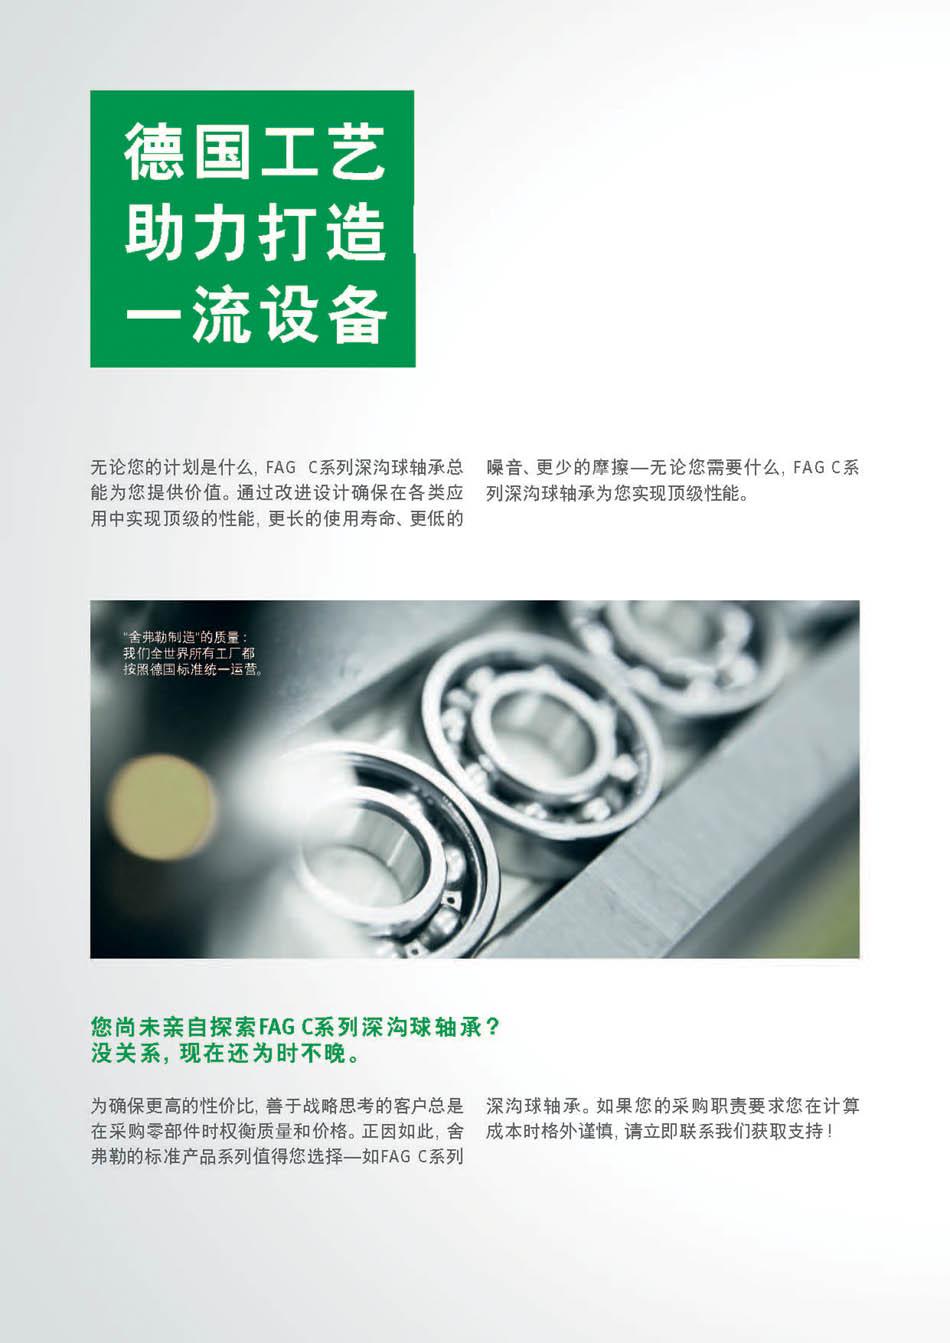 Brochure_GenerationC_CN_lowres4 (2)_页面_06.jpg